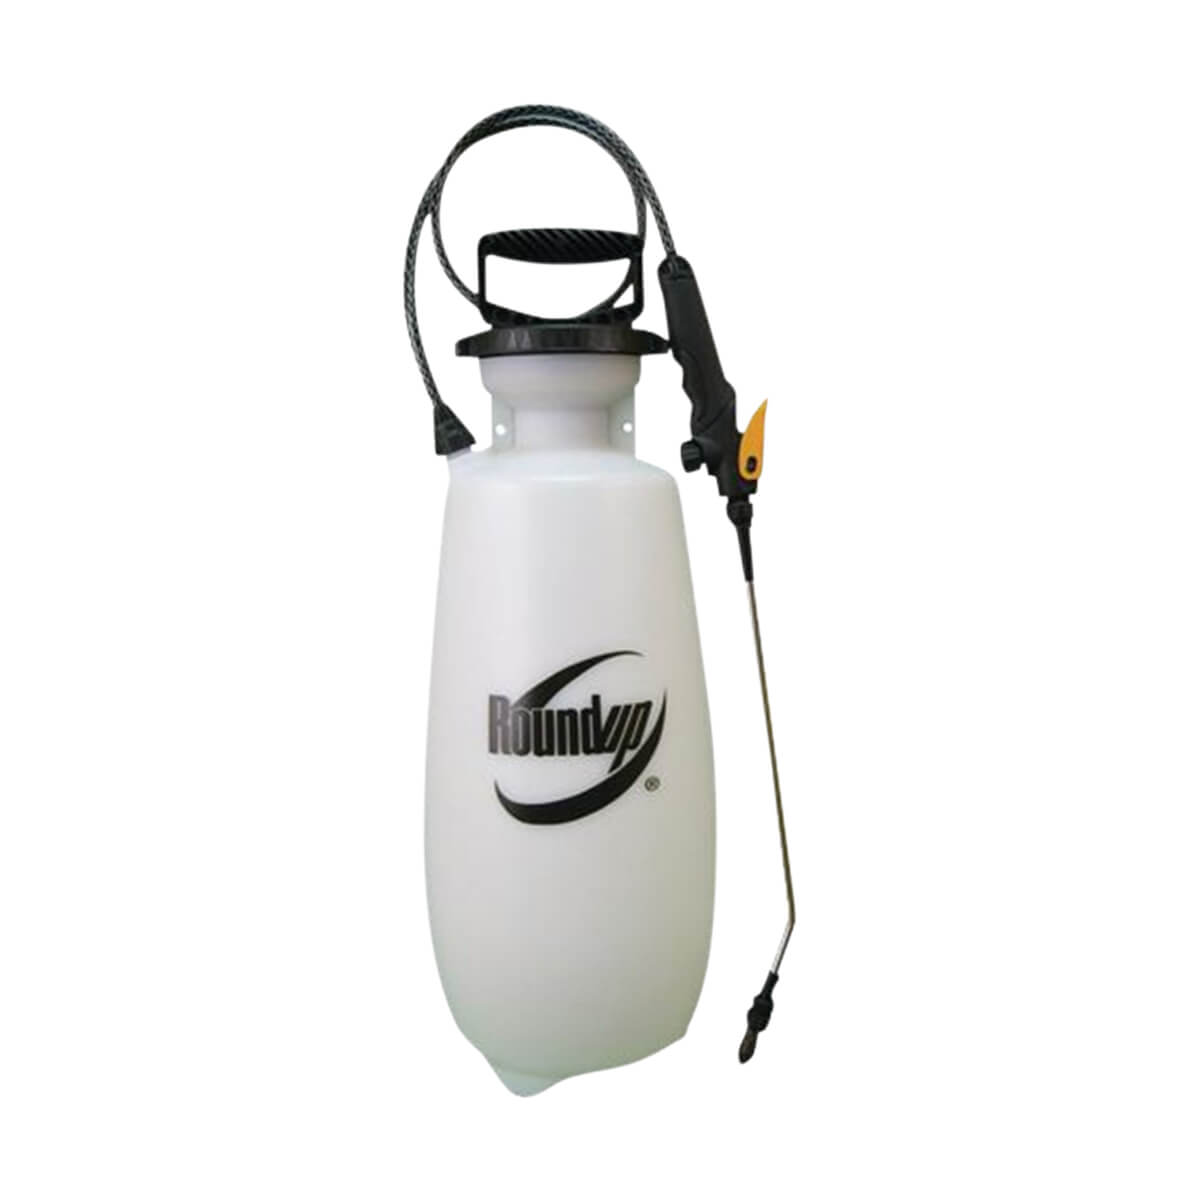 Roundup® Sprayer  - 3 Gallon